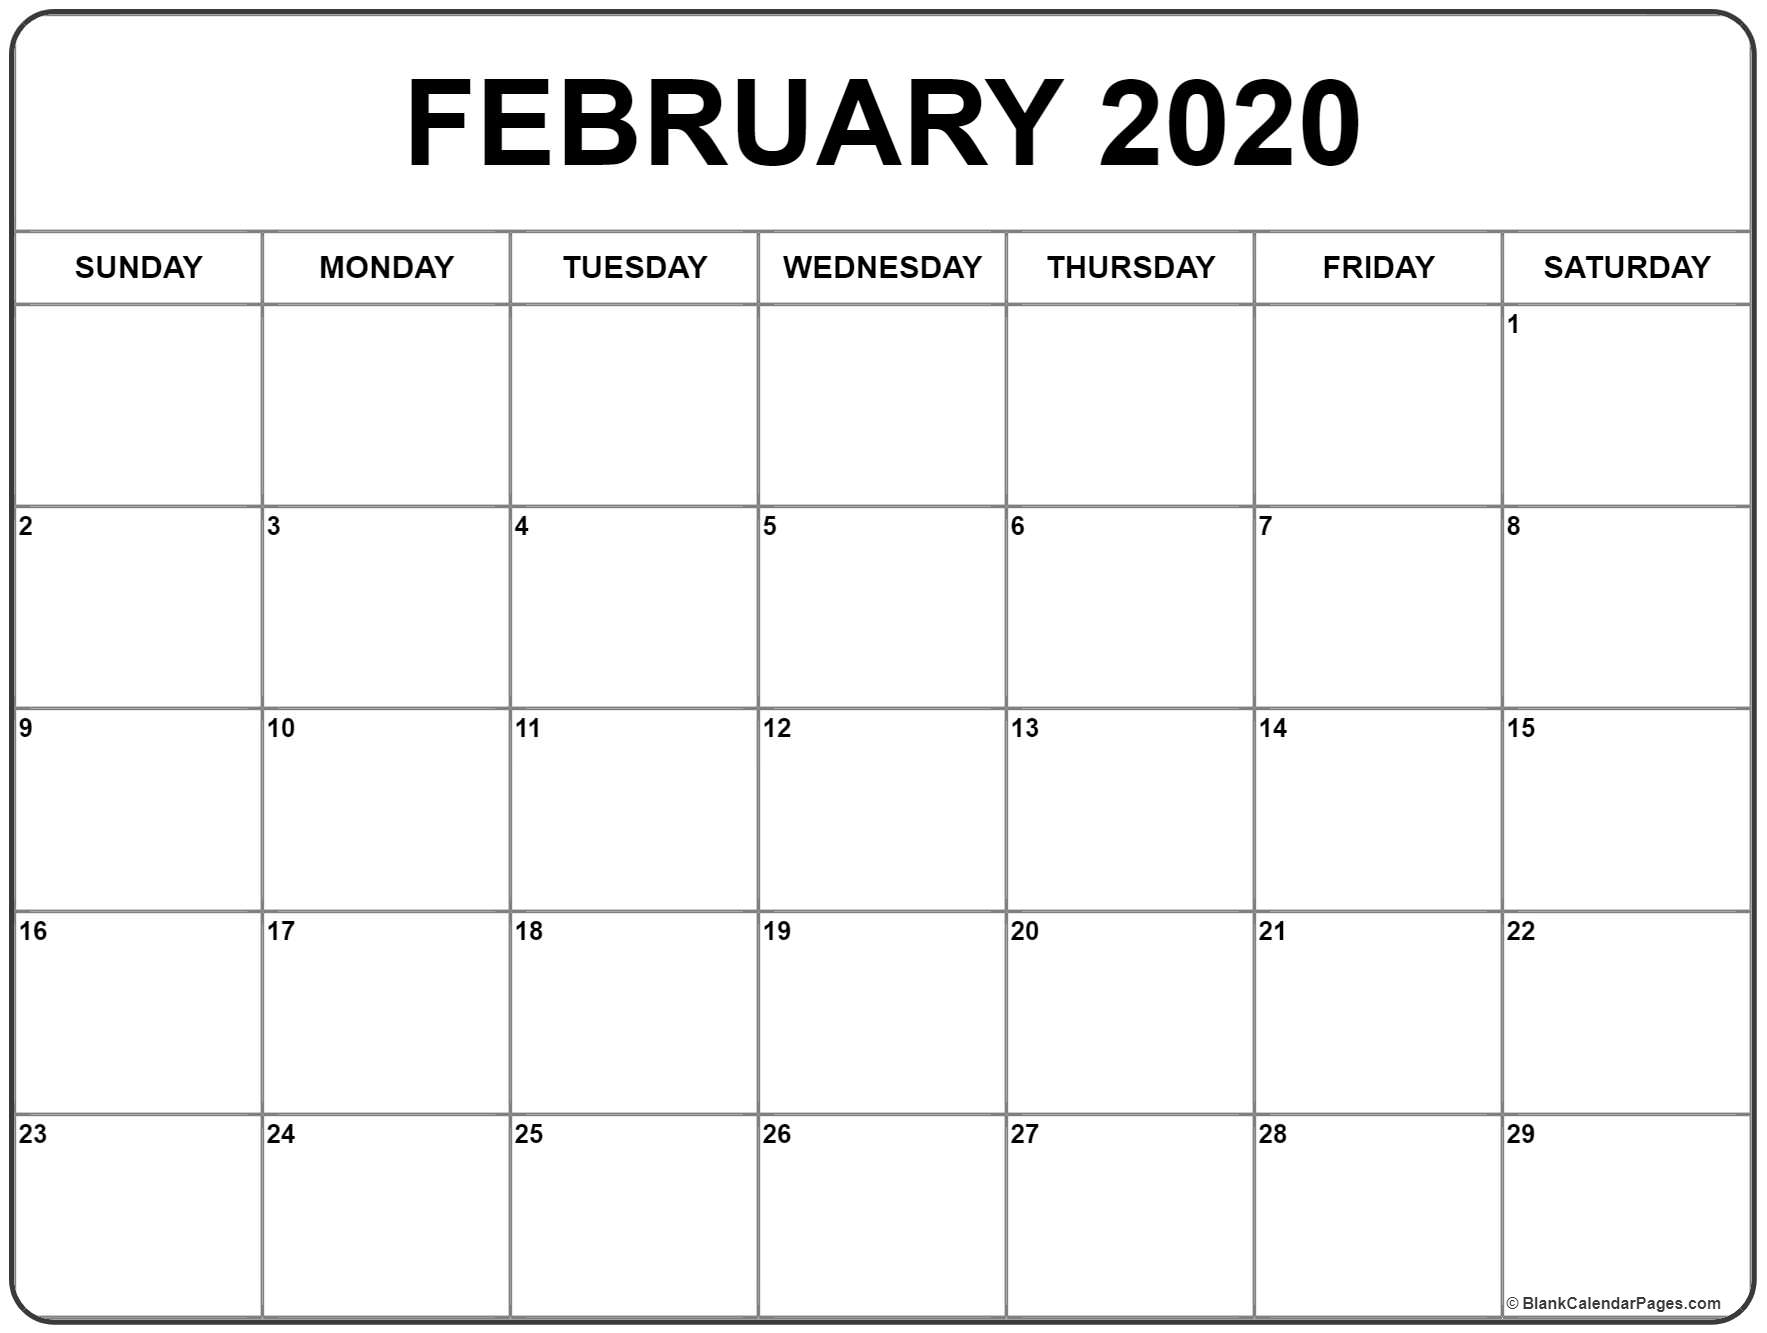 February 2020 Calendar Page